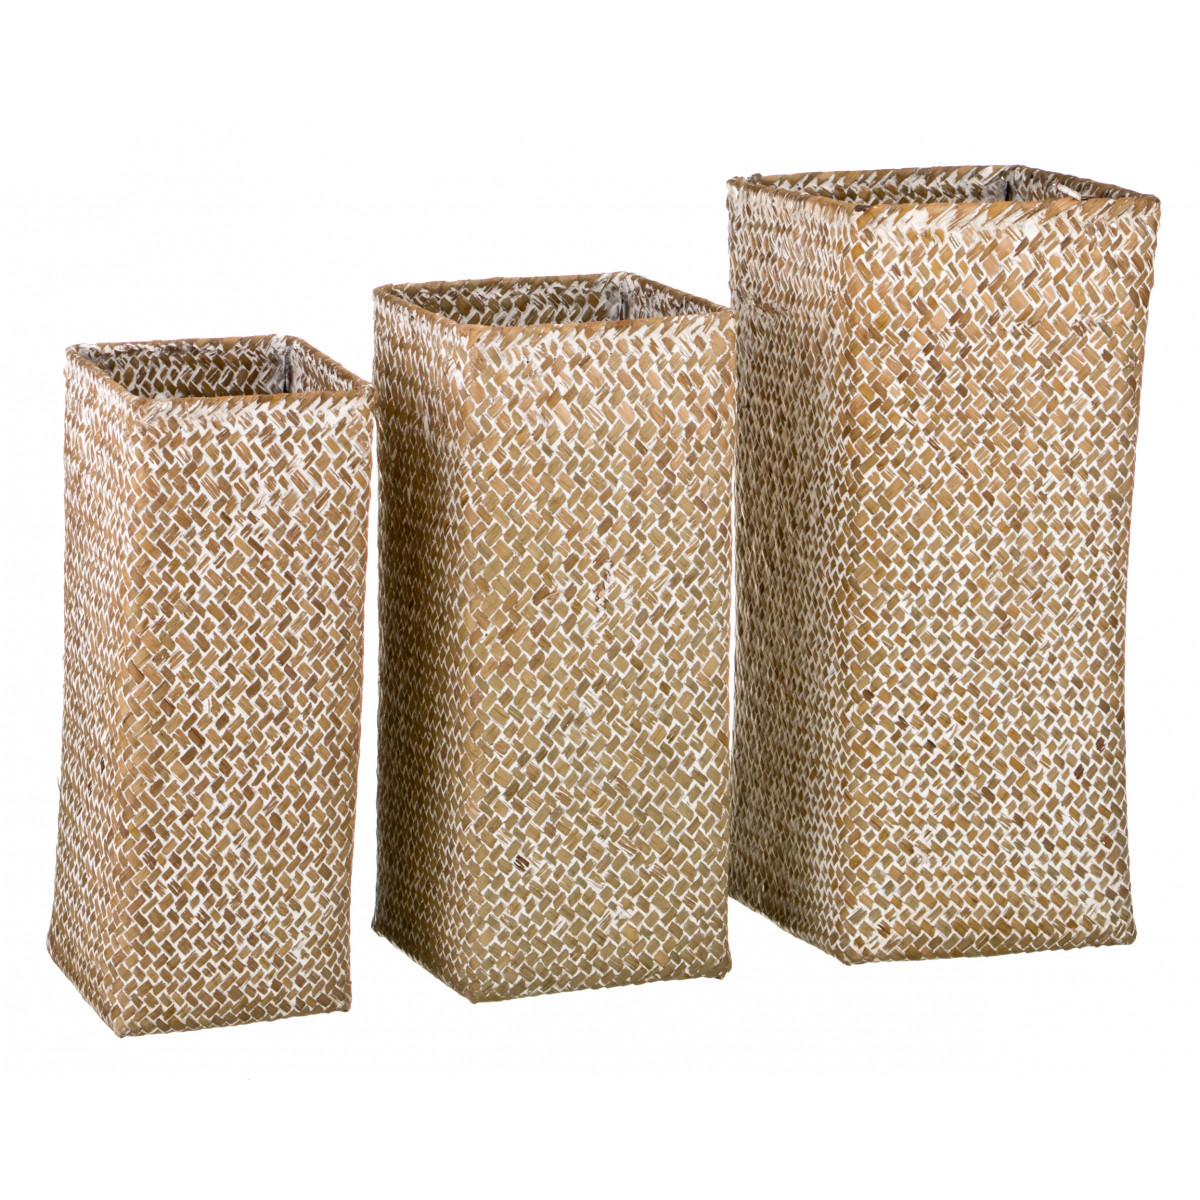 Купить со скидкой Корзины, коробки и контейнеры Arti-M